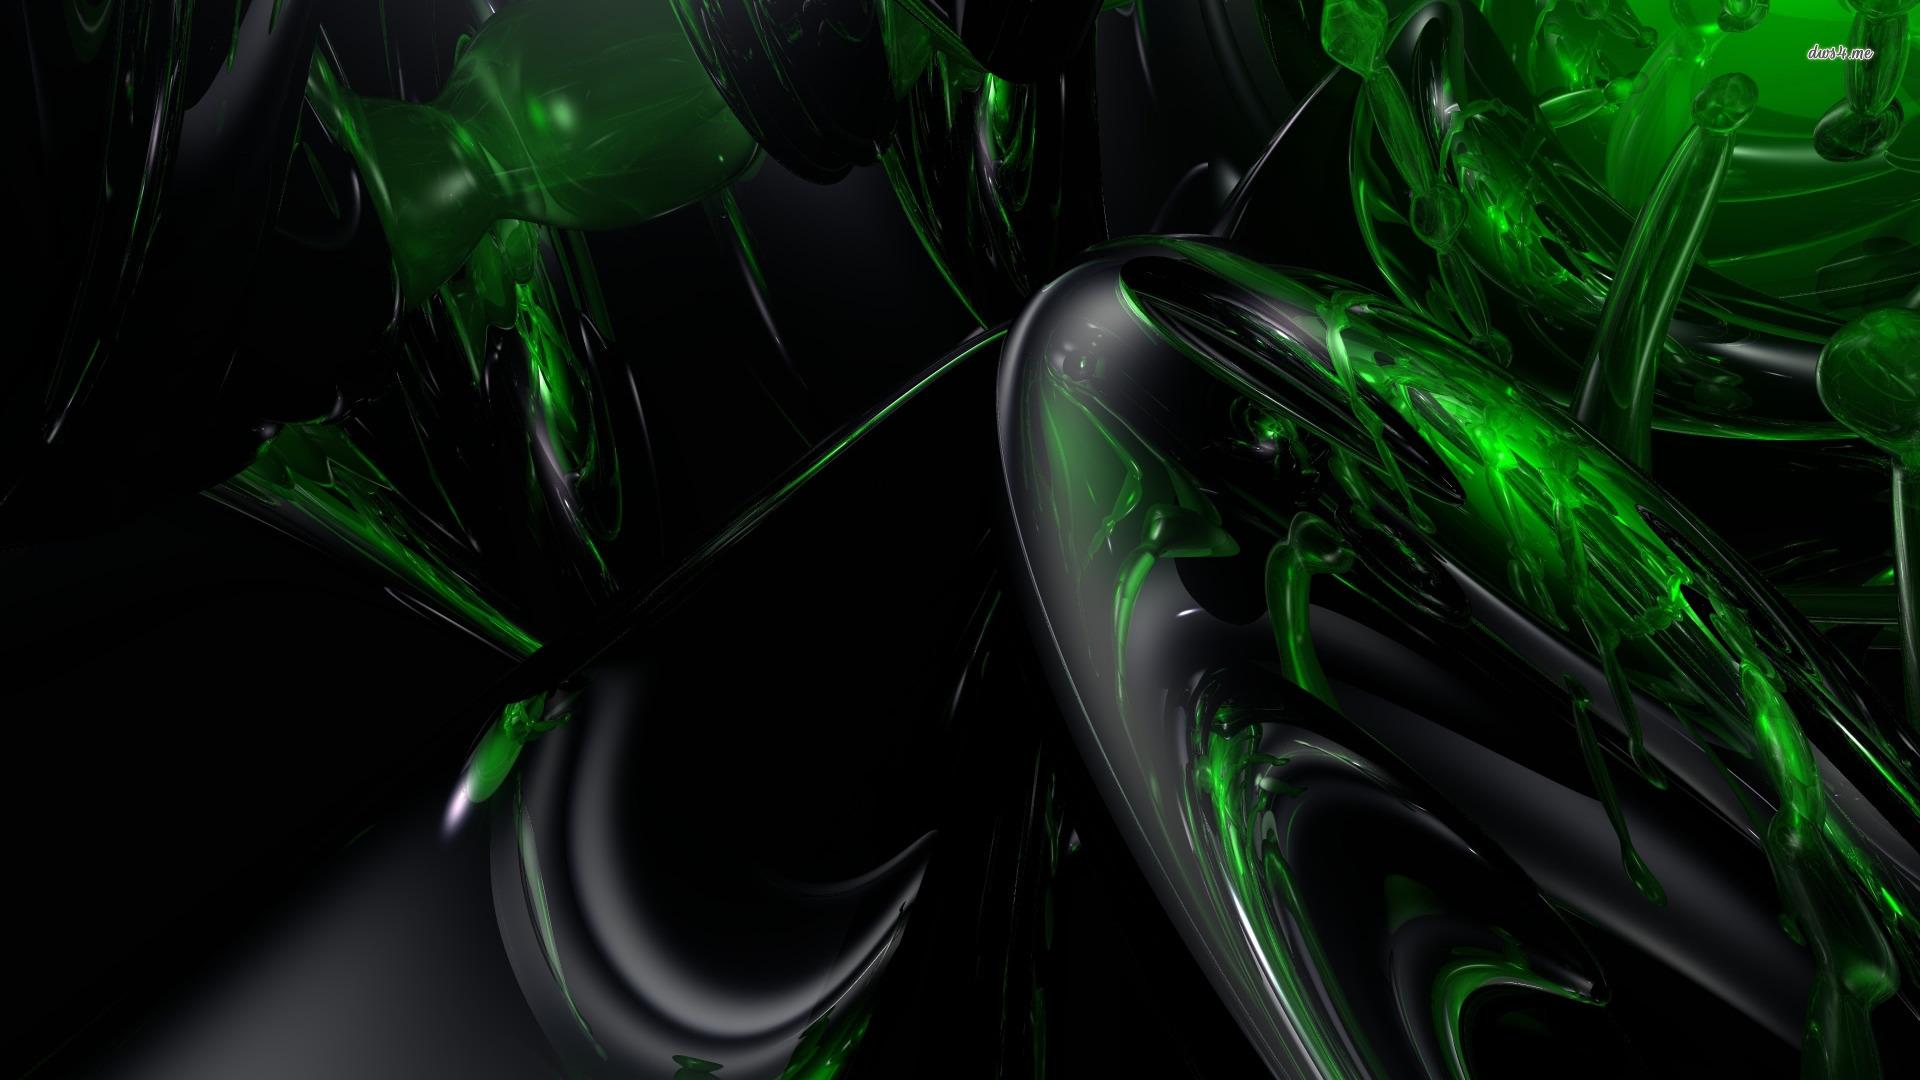 46 Dark Green Wallpaper Hd On Wallpapersafari